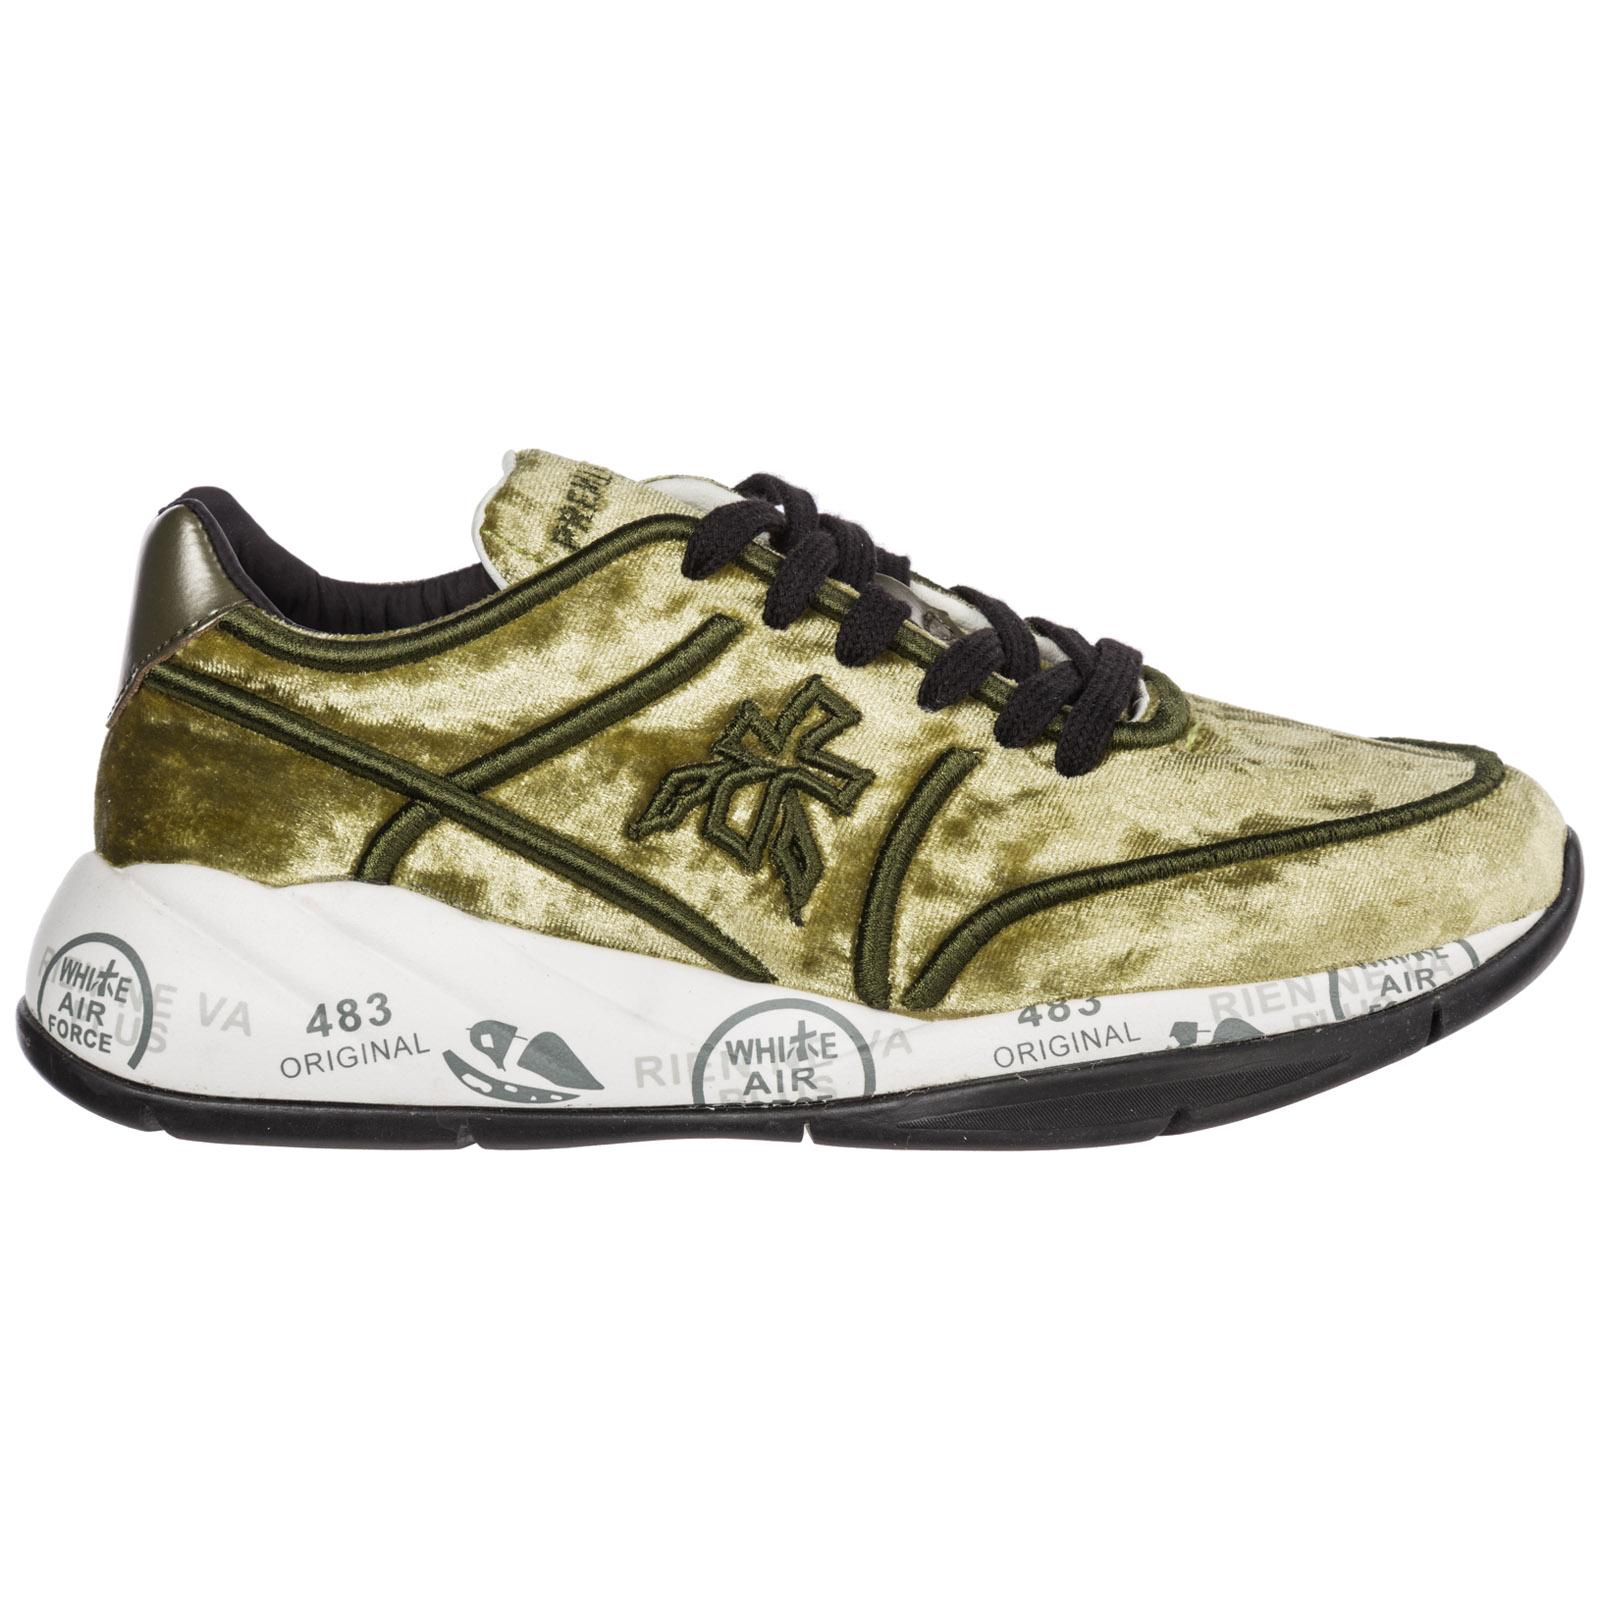 promo code 3e0cd f1573 Scarpe sneakers donna liu